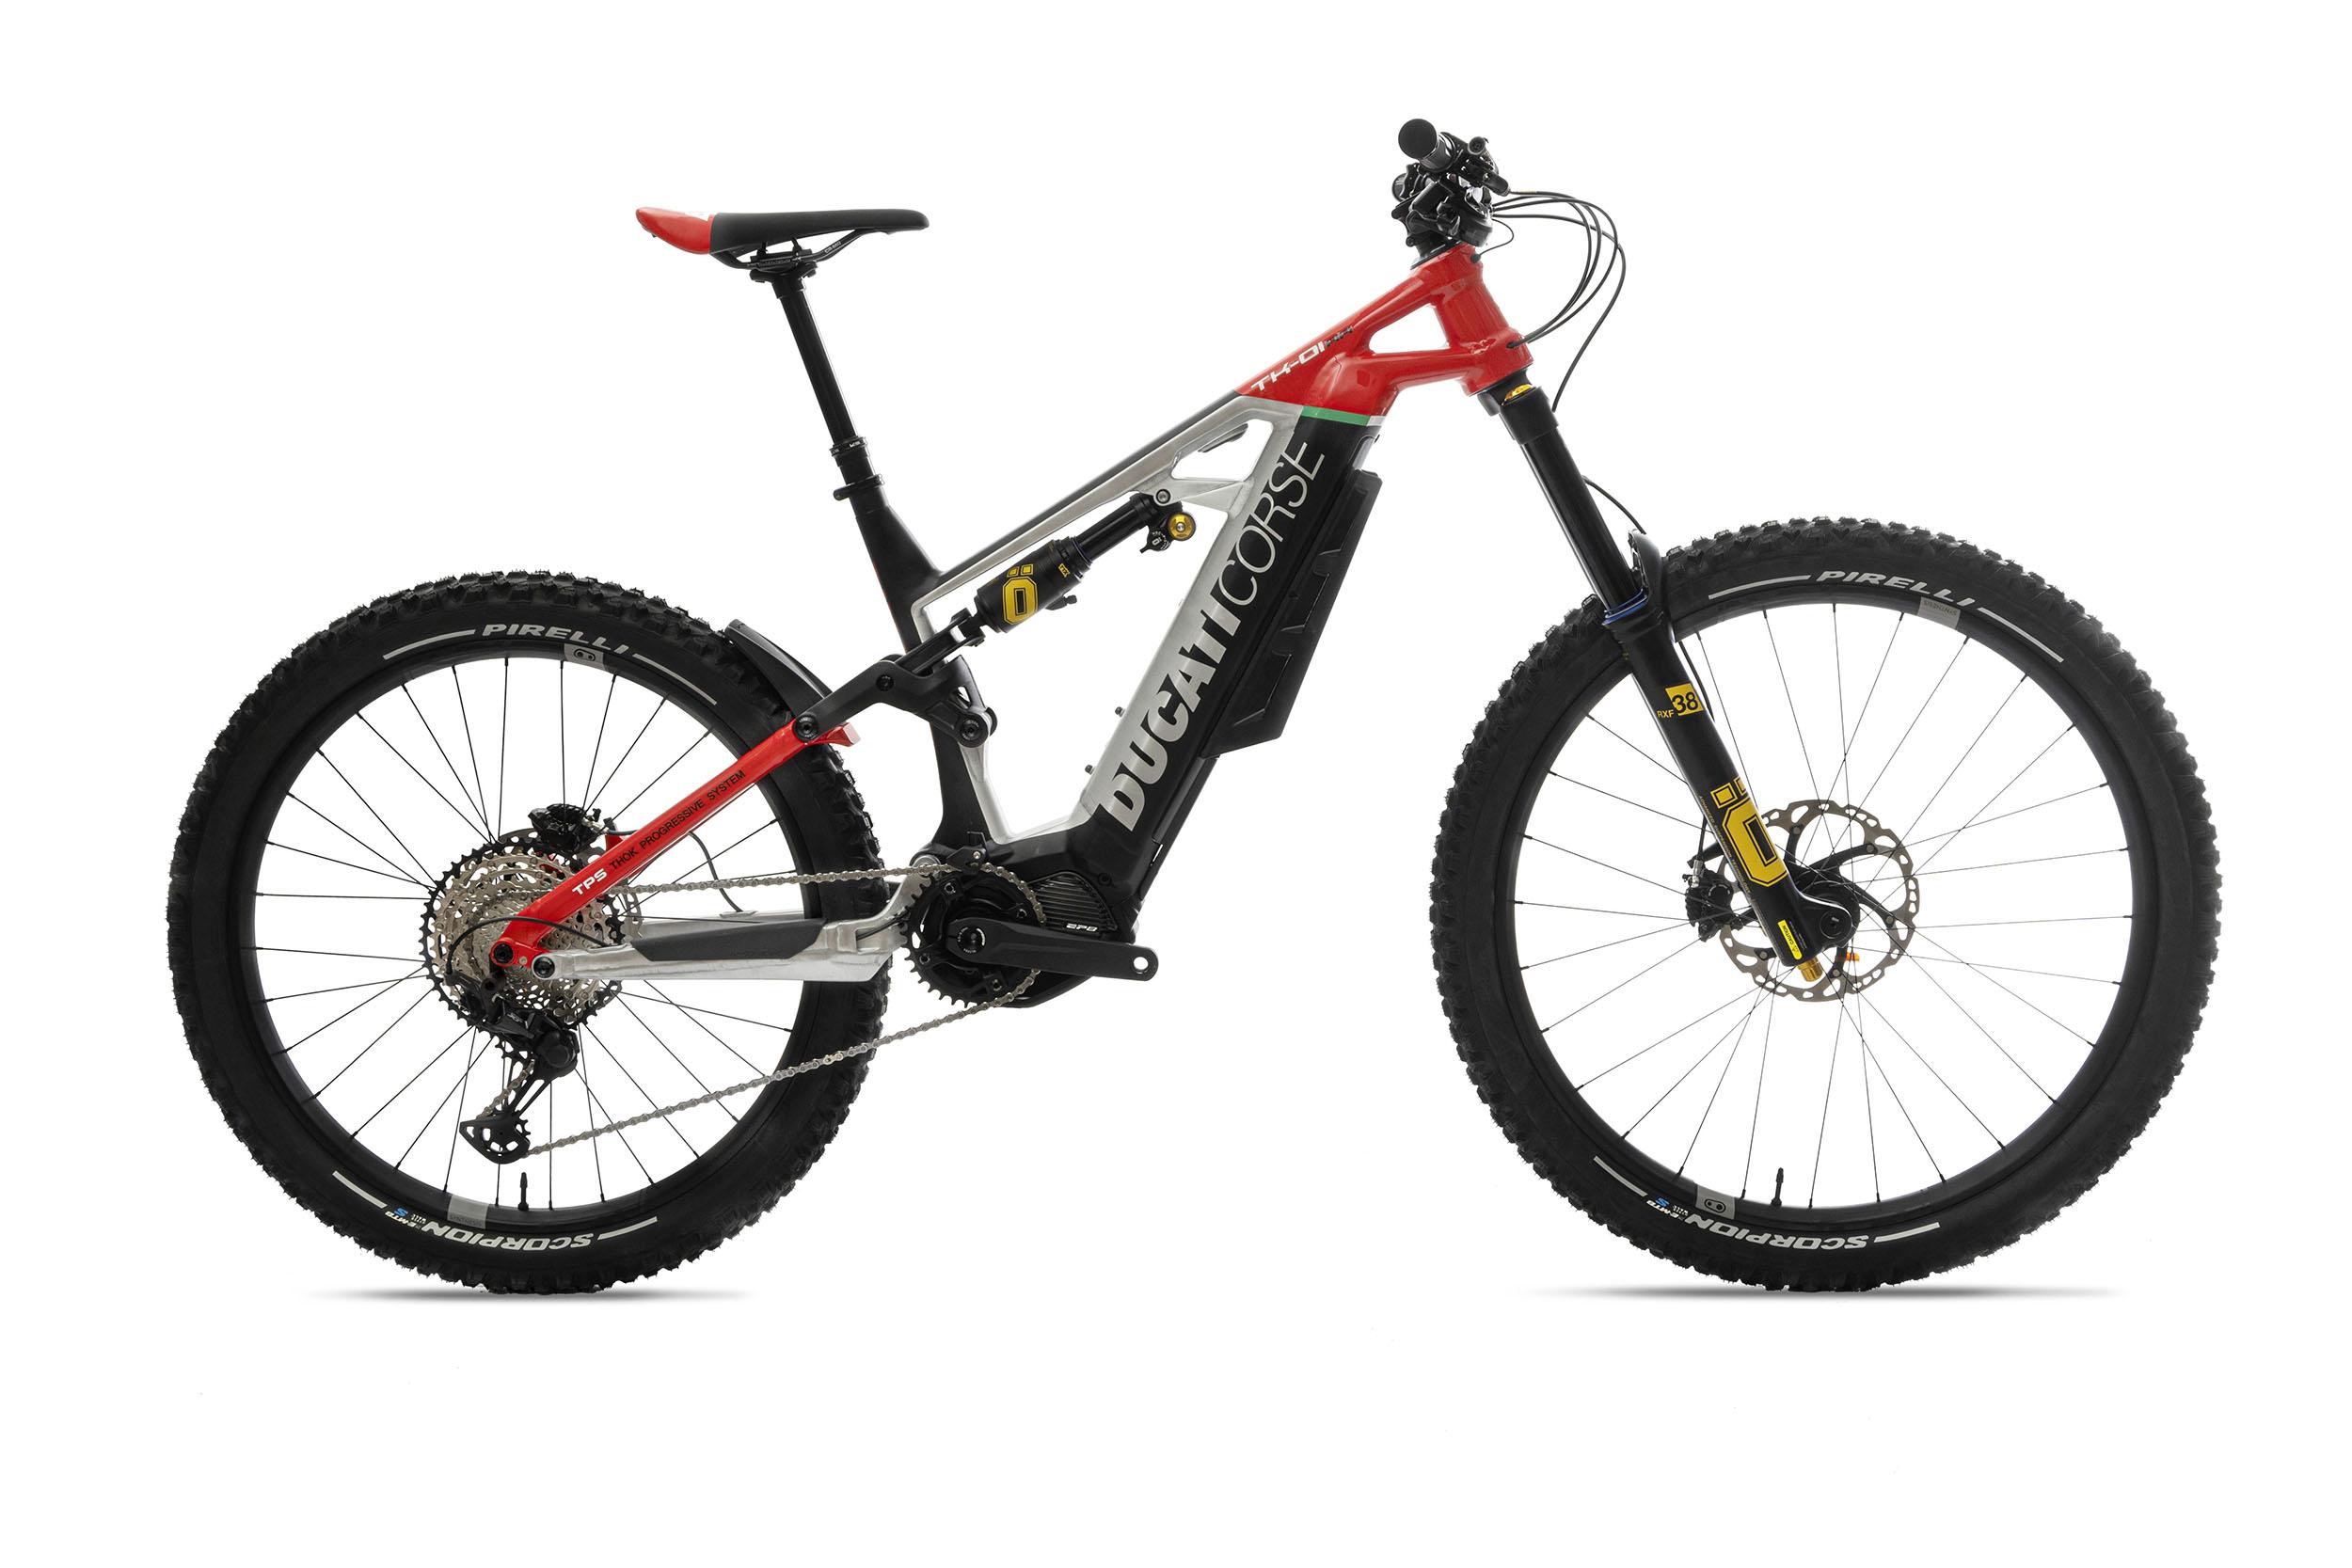 201118 2021 Ducati_TK-01RR _1__UC211368_High